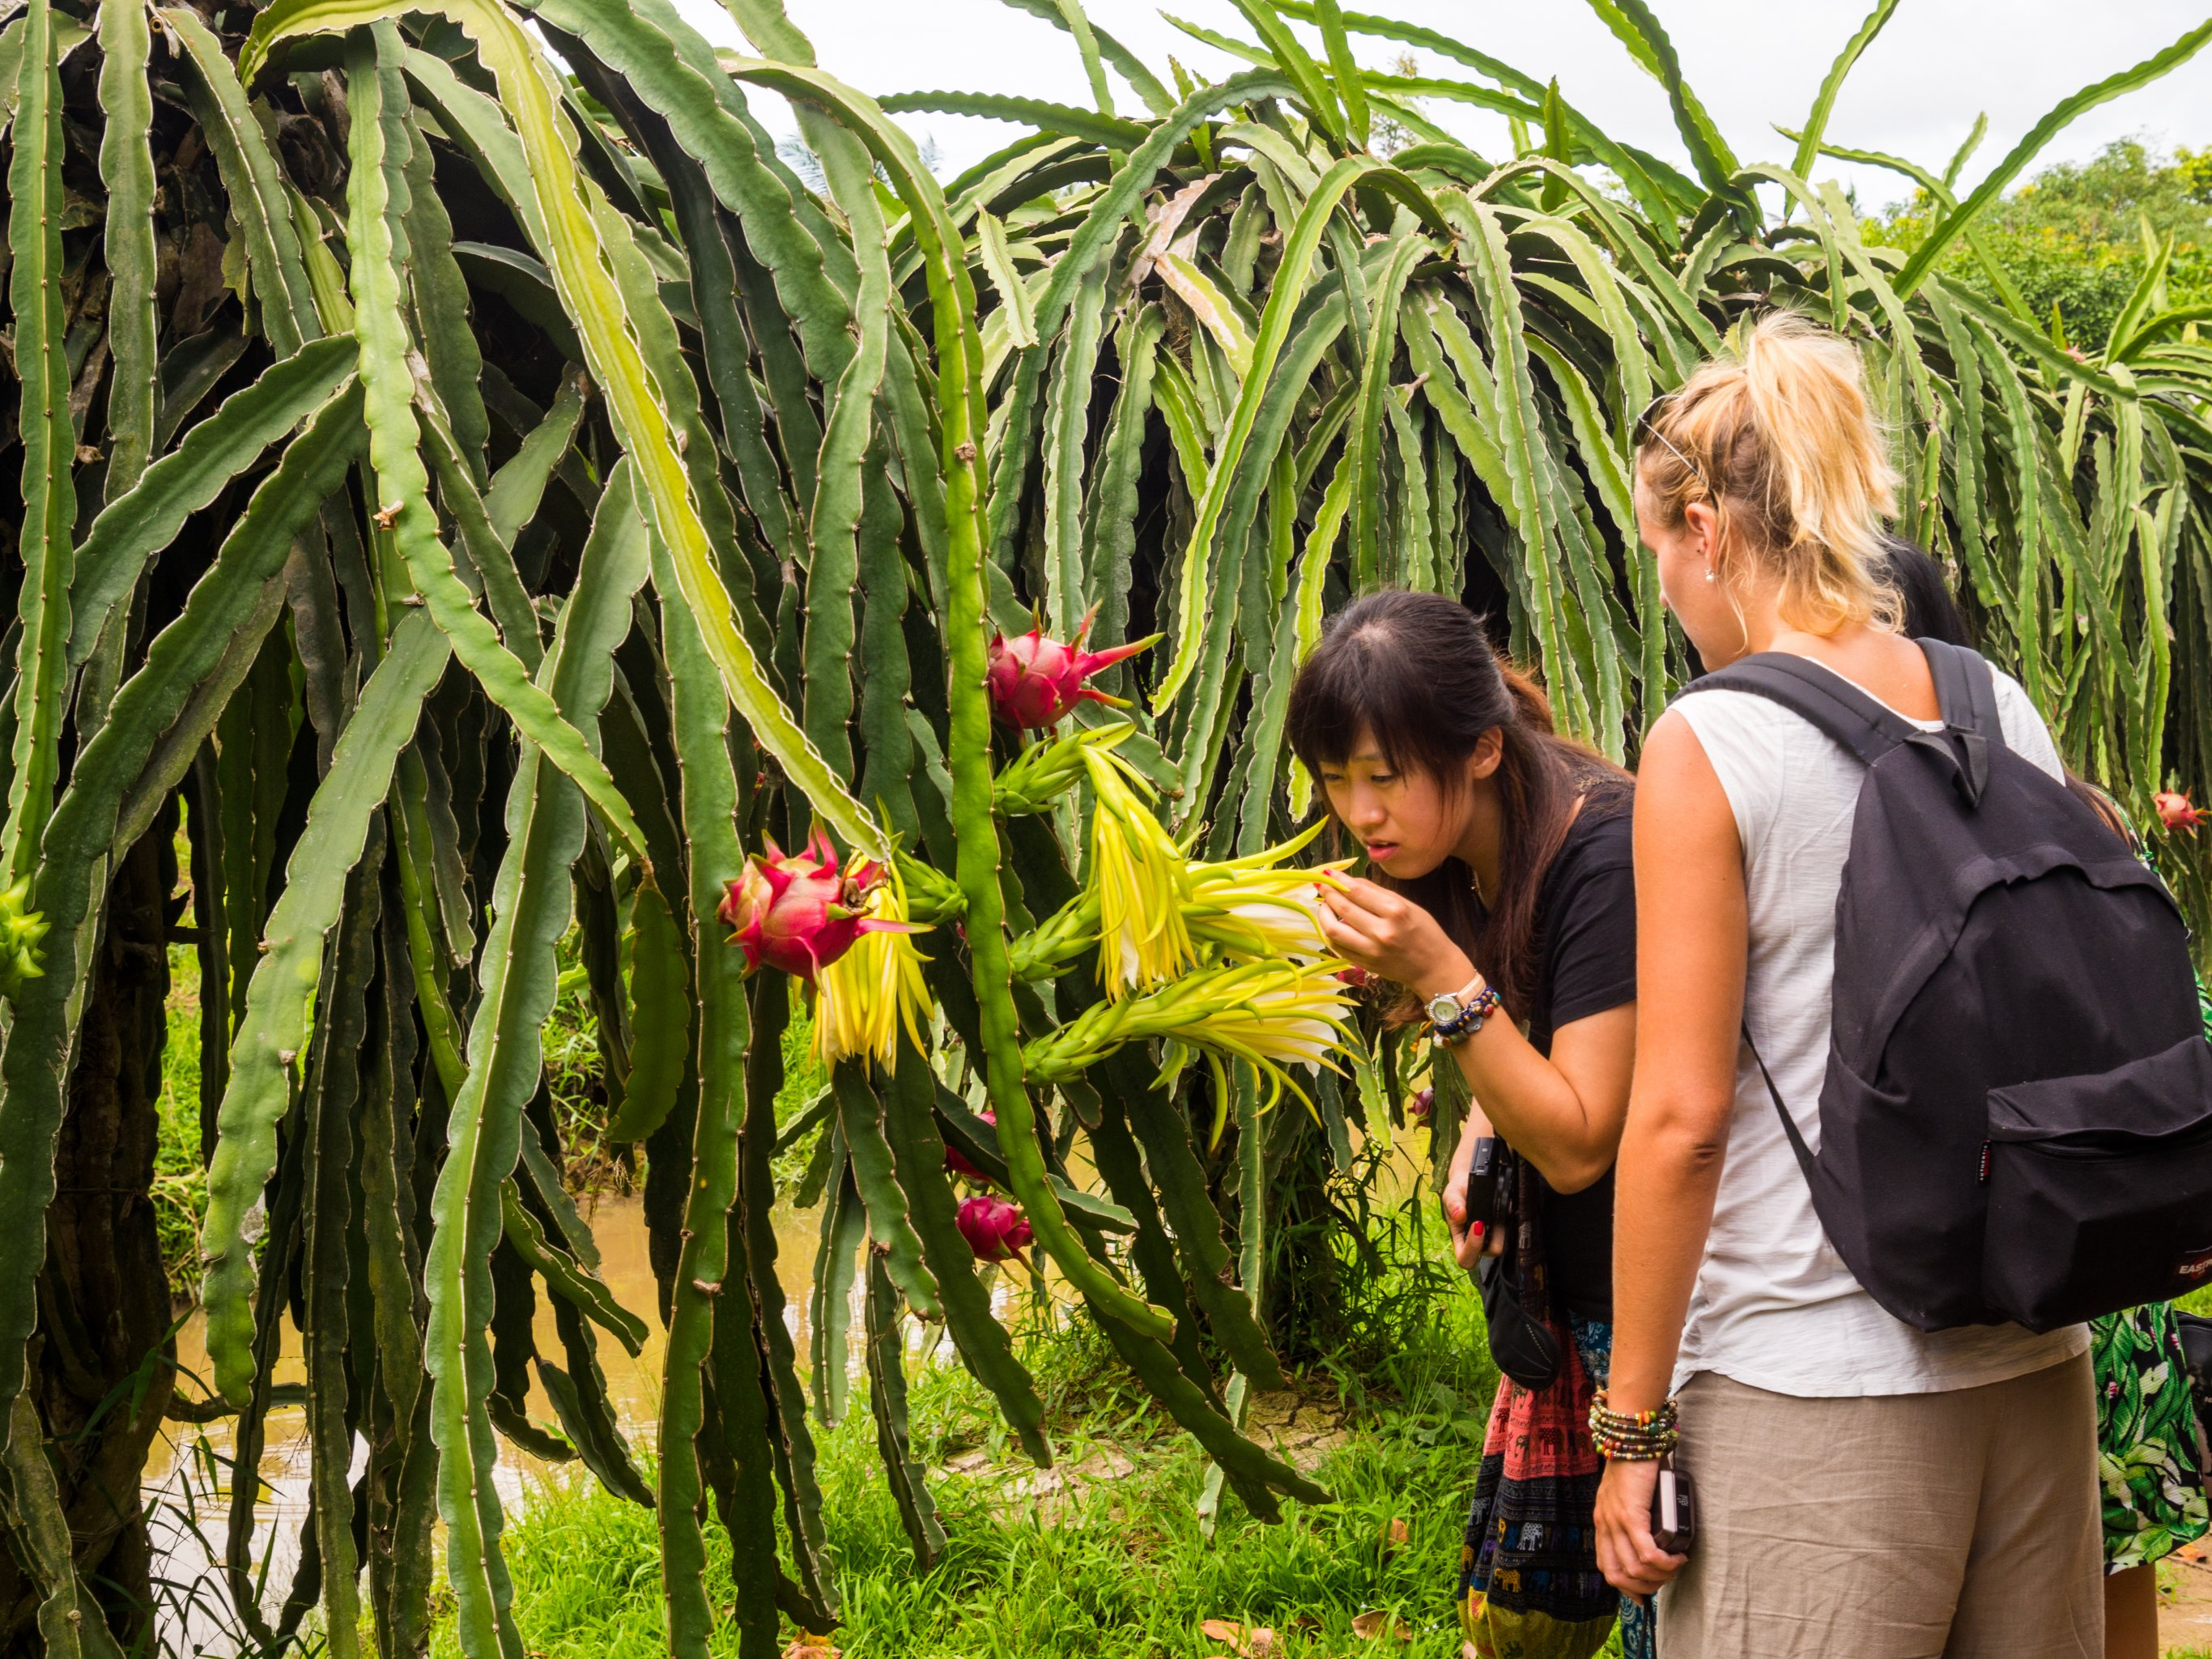 2-Day Ho Chi Minh City & Mekong Delta Tour - Vietnam Itinerary